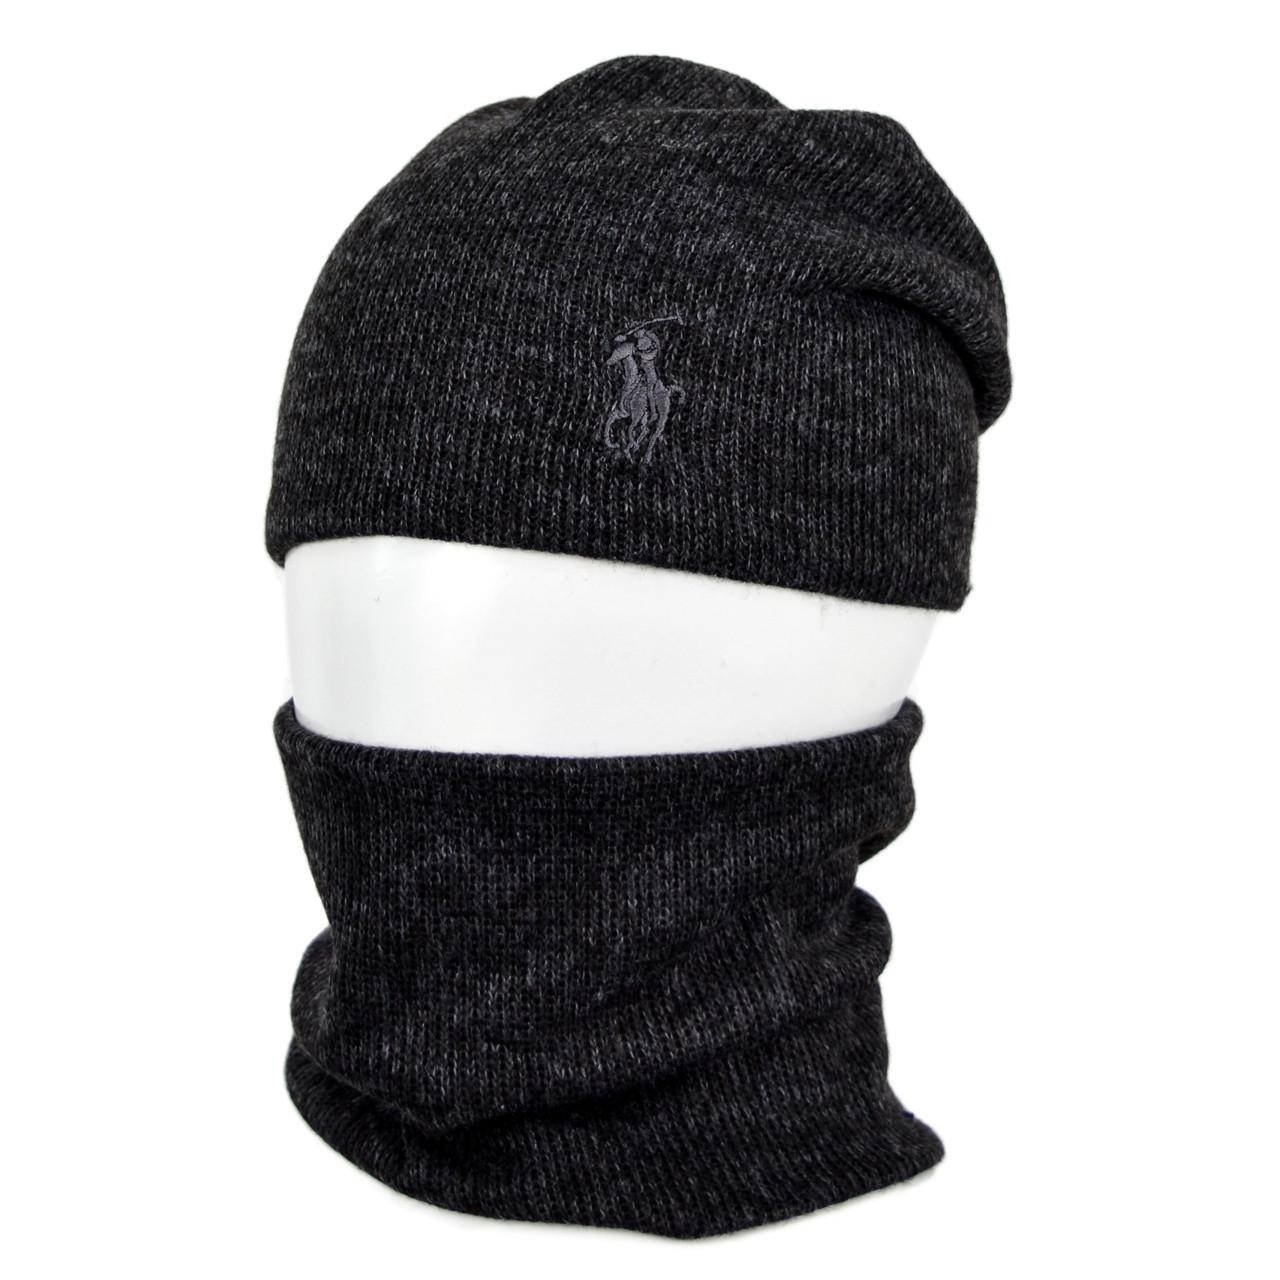 Комплект шапка+баф Polo SP1902 черный